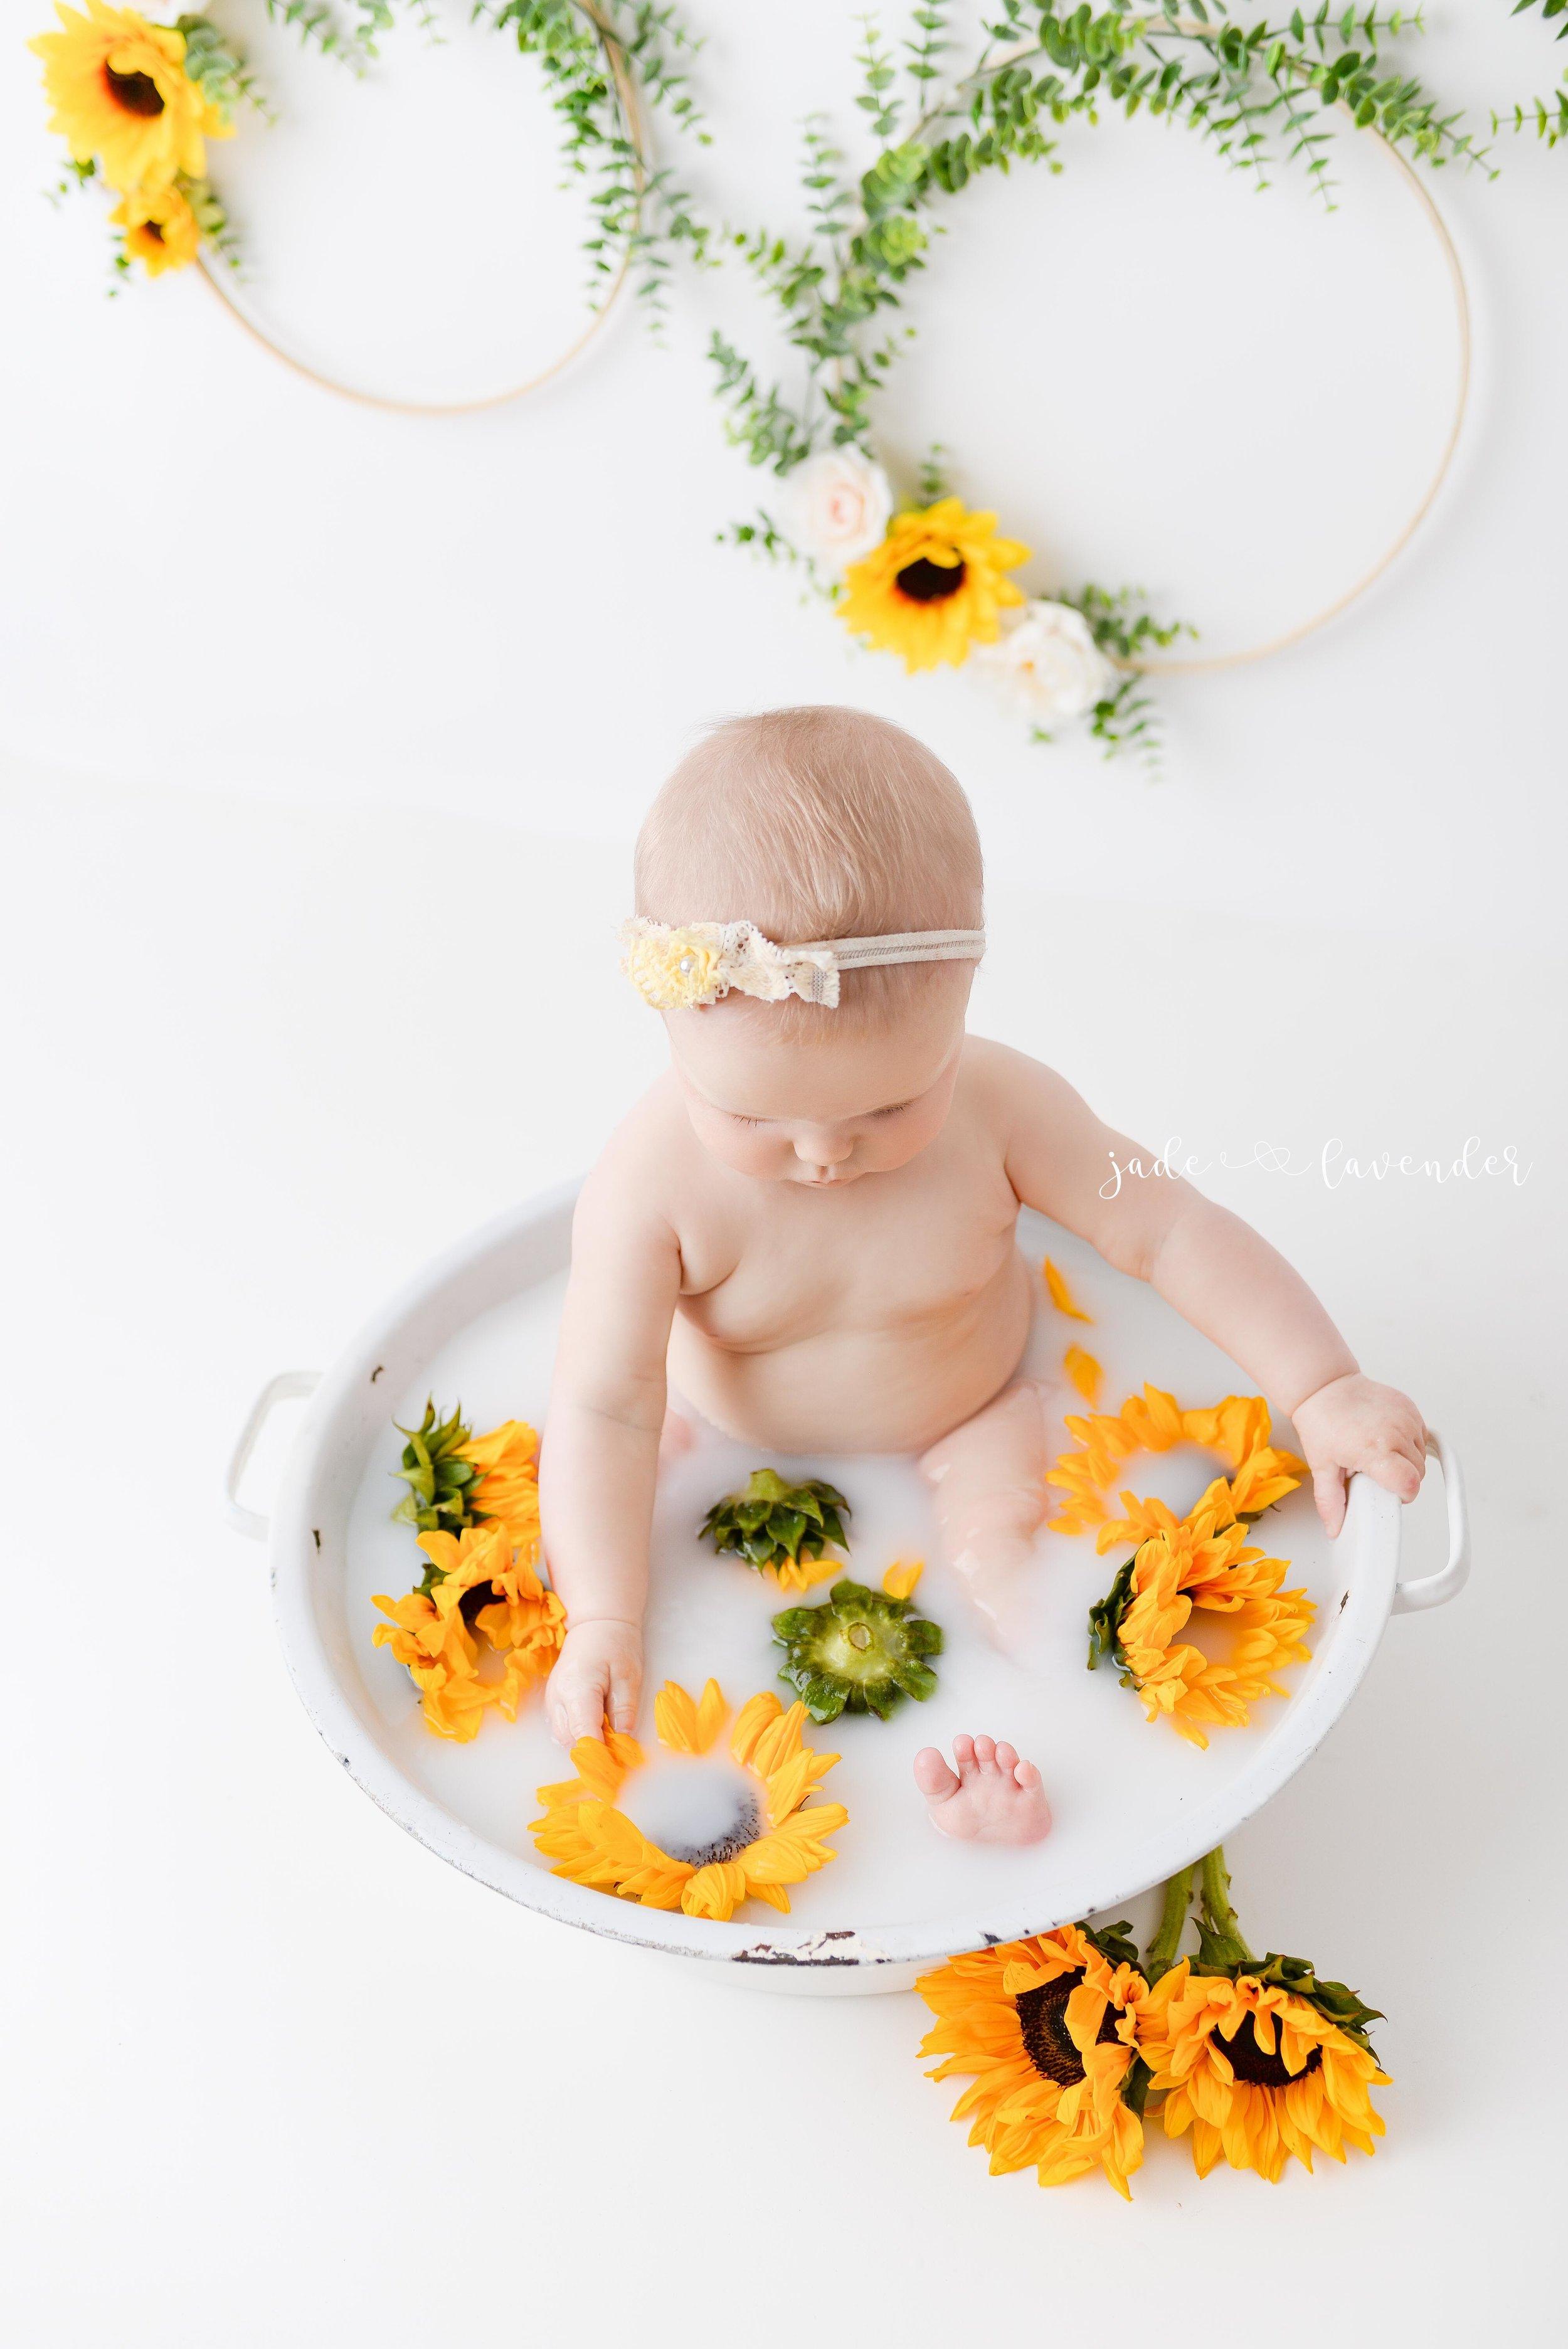 Baby-girl-milestone-milkbath-six-month-newborn-photography-infant-images-baby-photos-photographer-spokane-washington (4 of 5).jpg